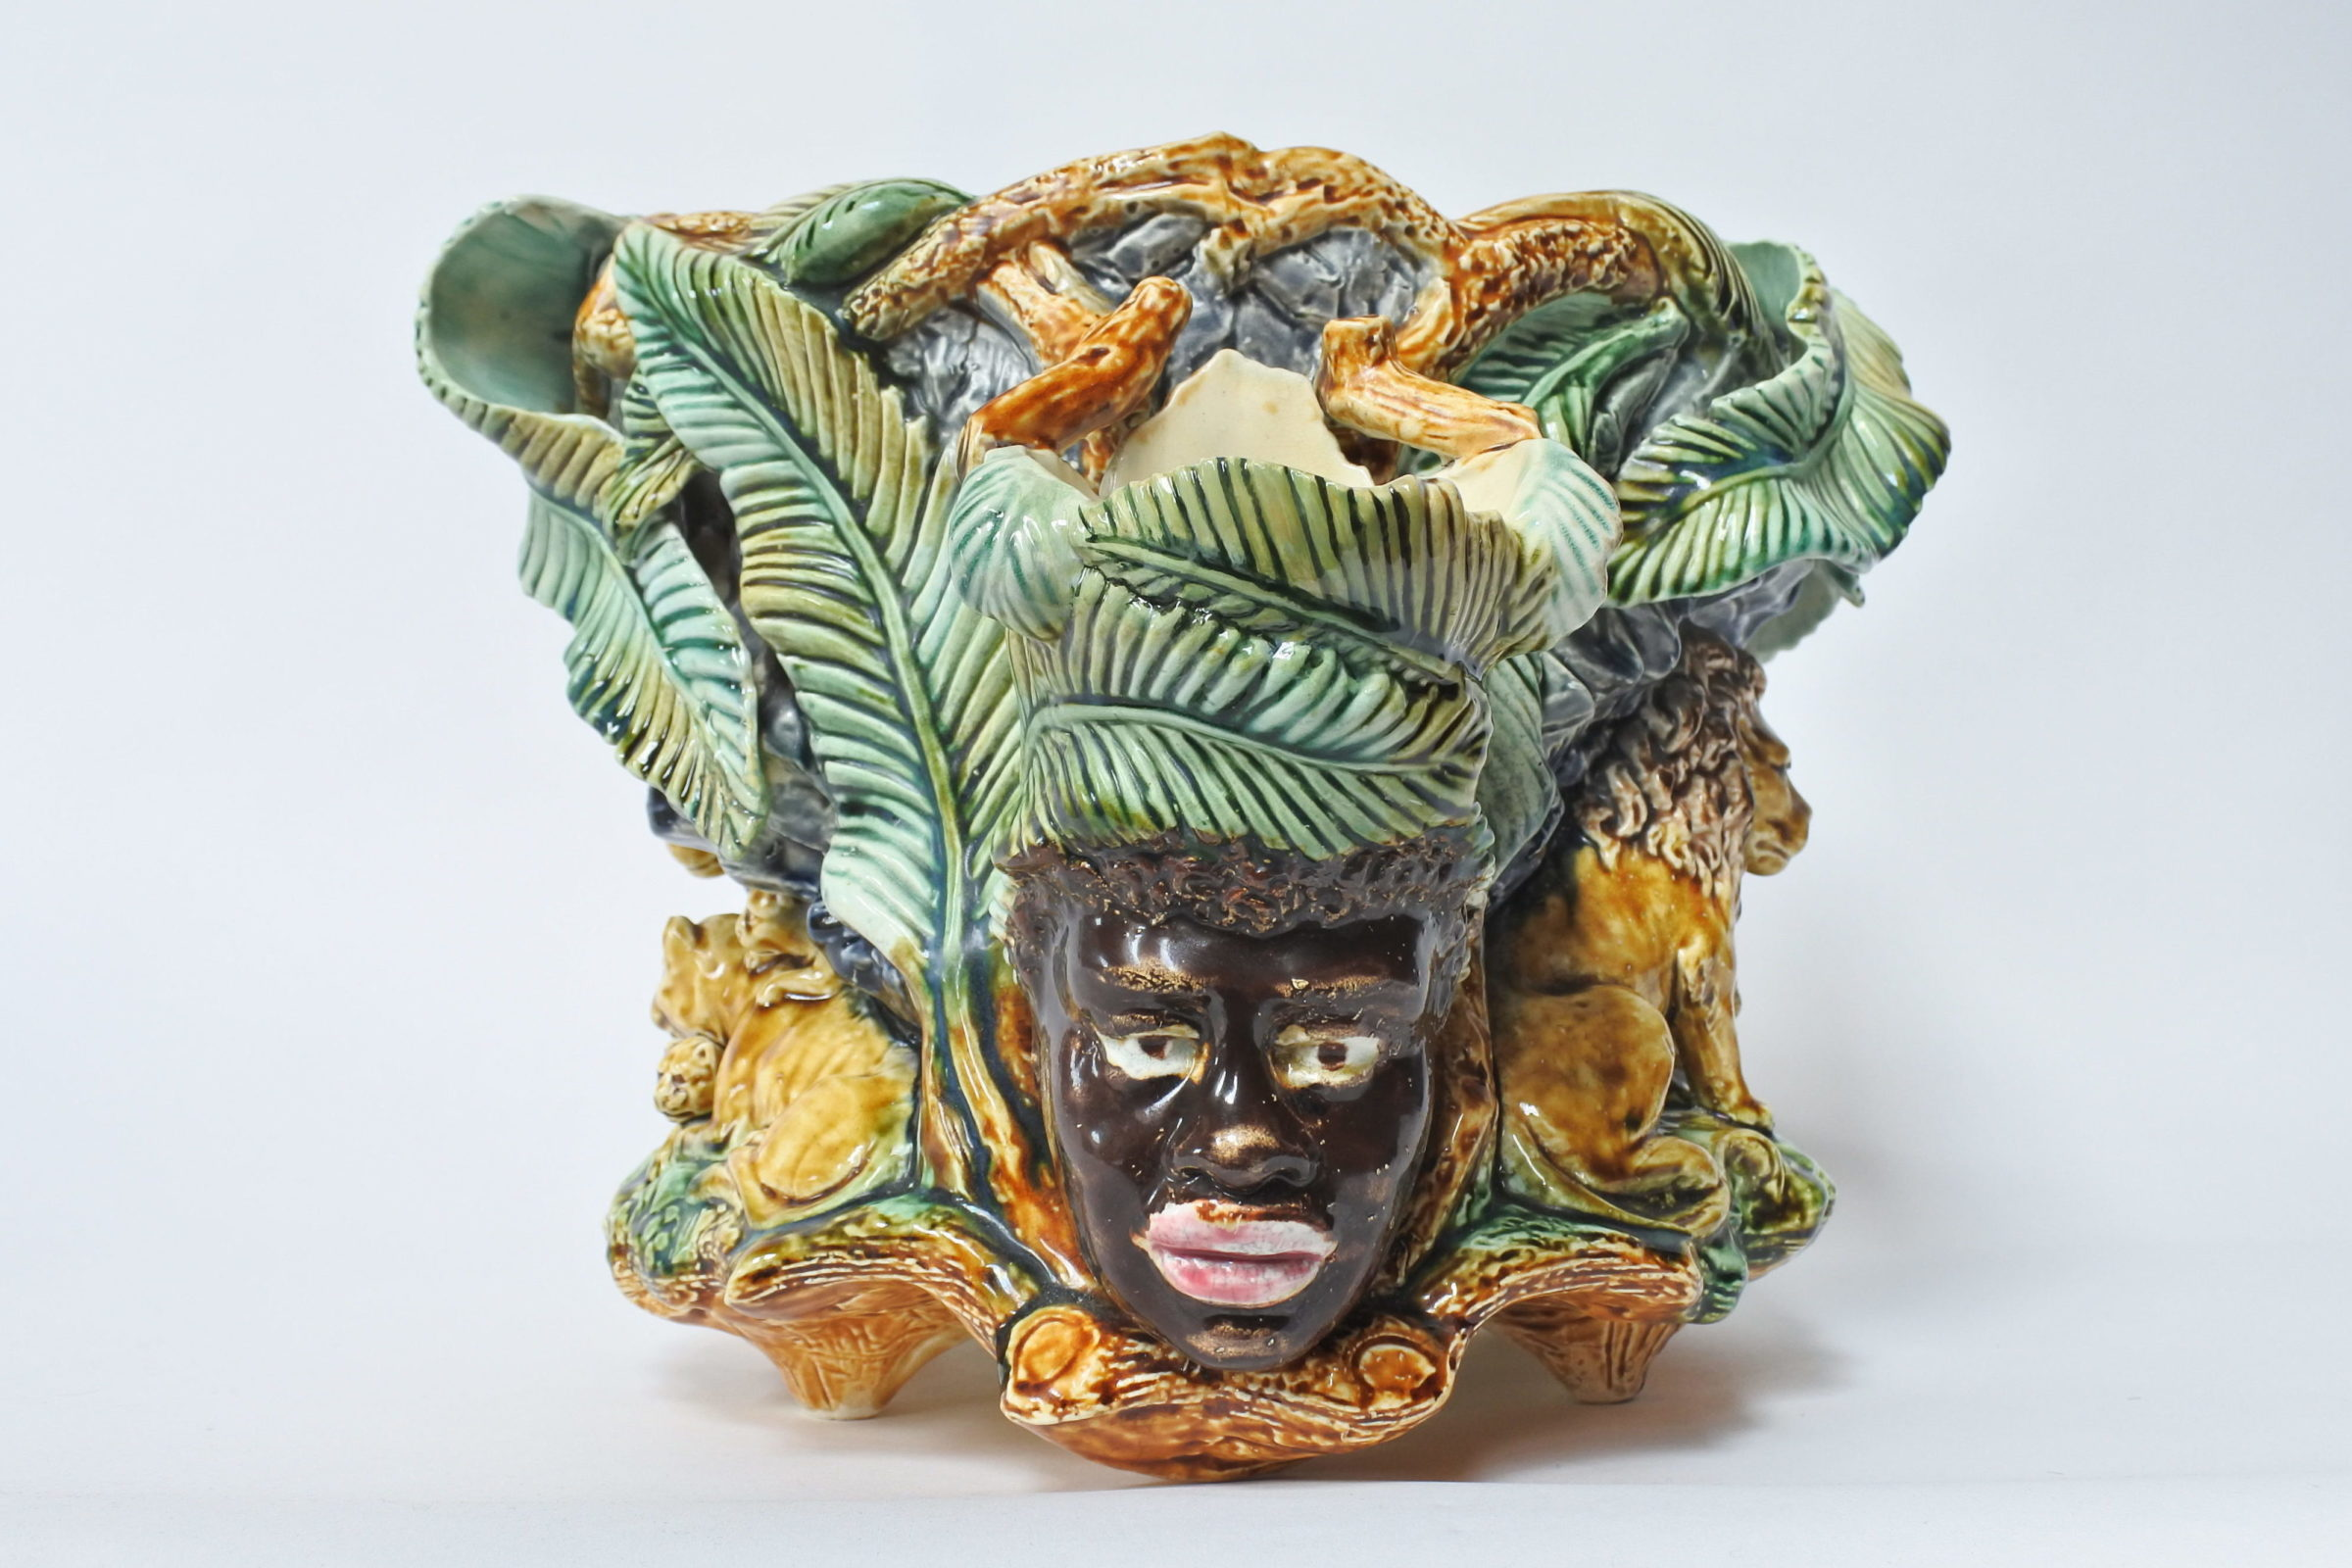 Centrotavola in ceramica barbotine con funzione di jardinière - Onnaing - 3